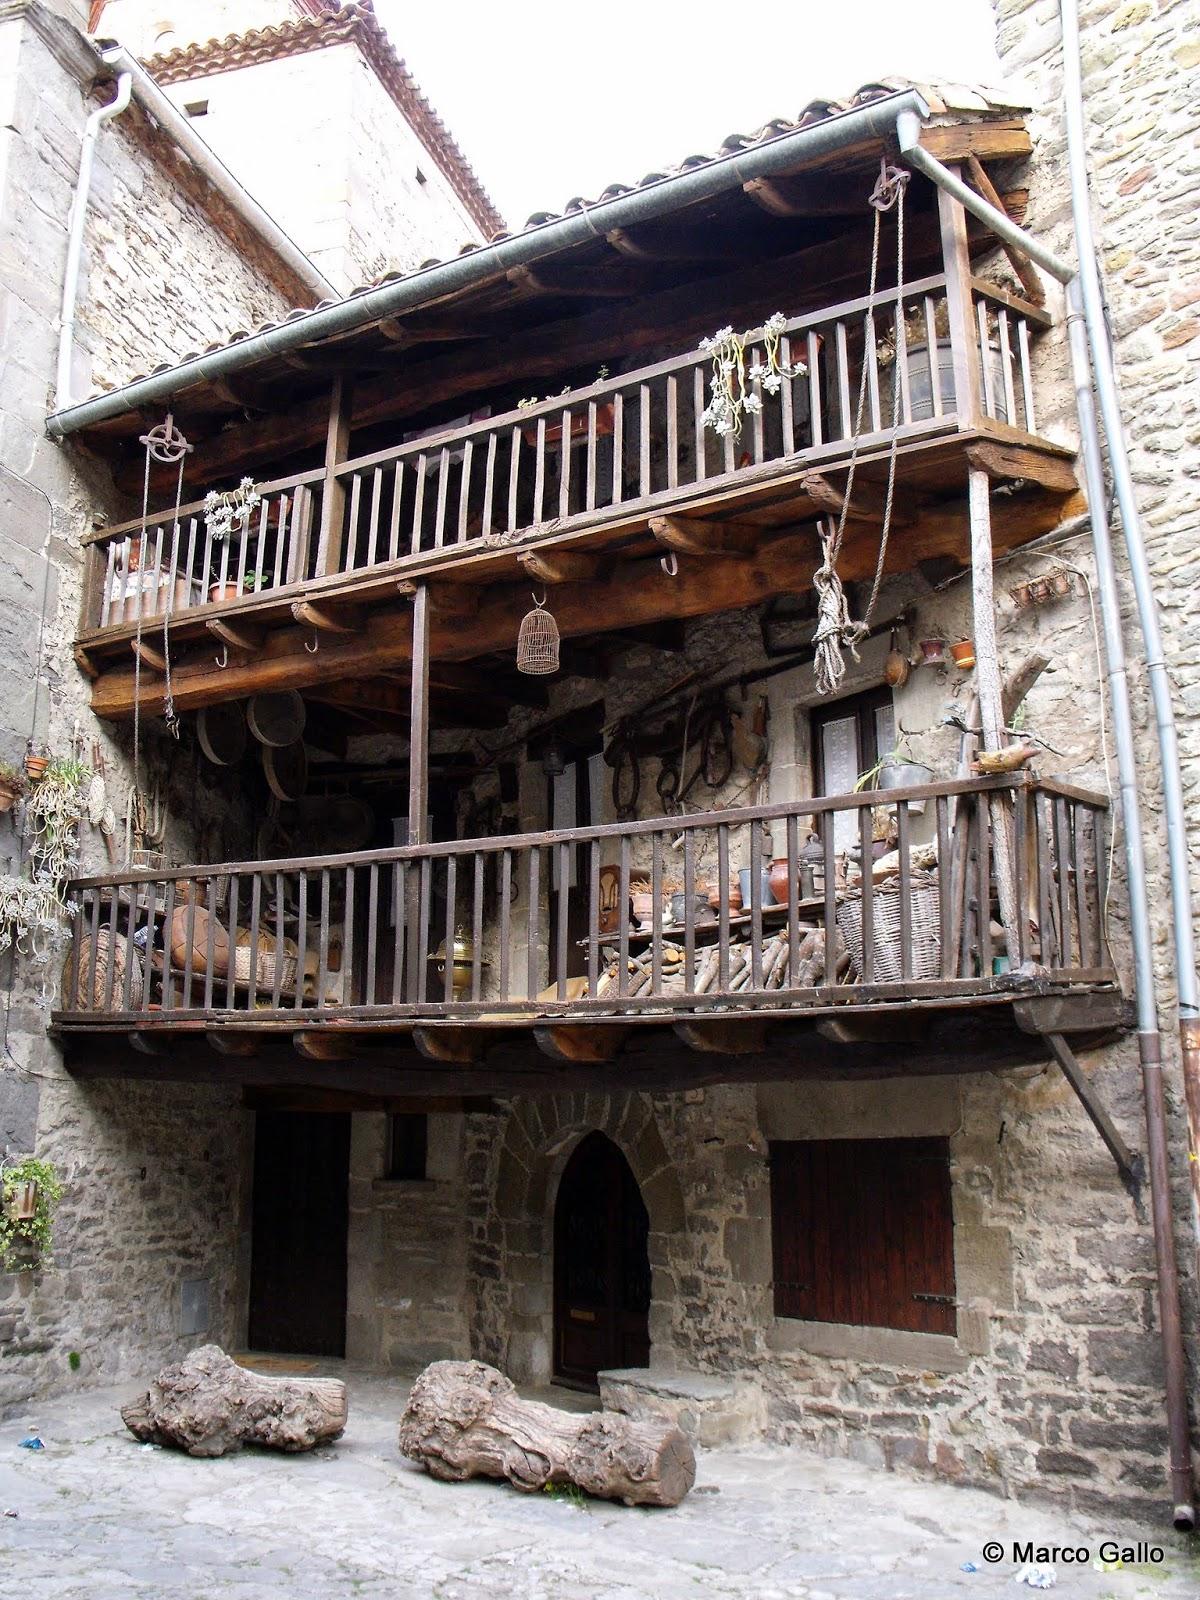 Vivir viajando rupit y pruit arquitectura medieval en for Arquitectura medieval